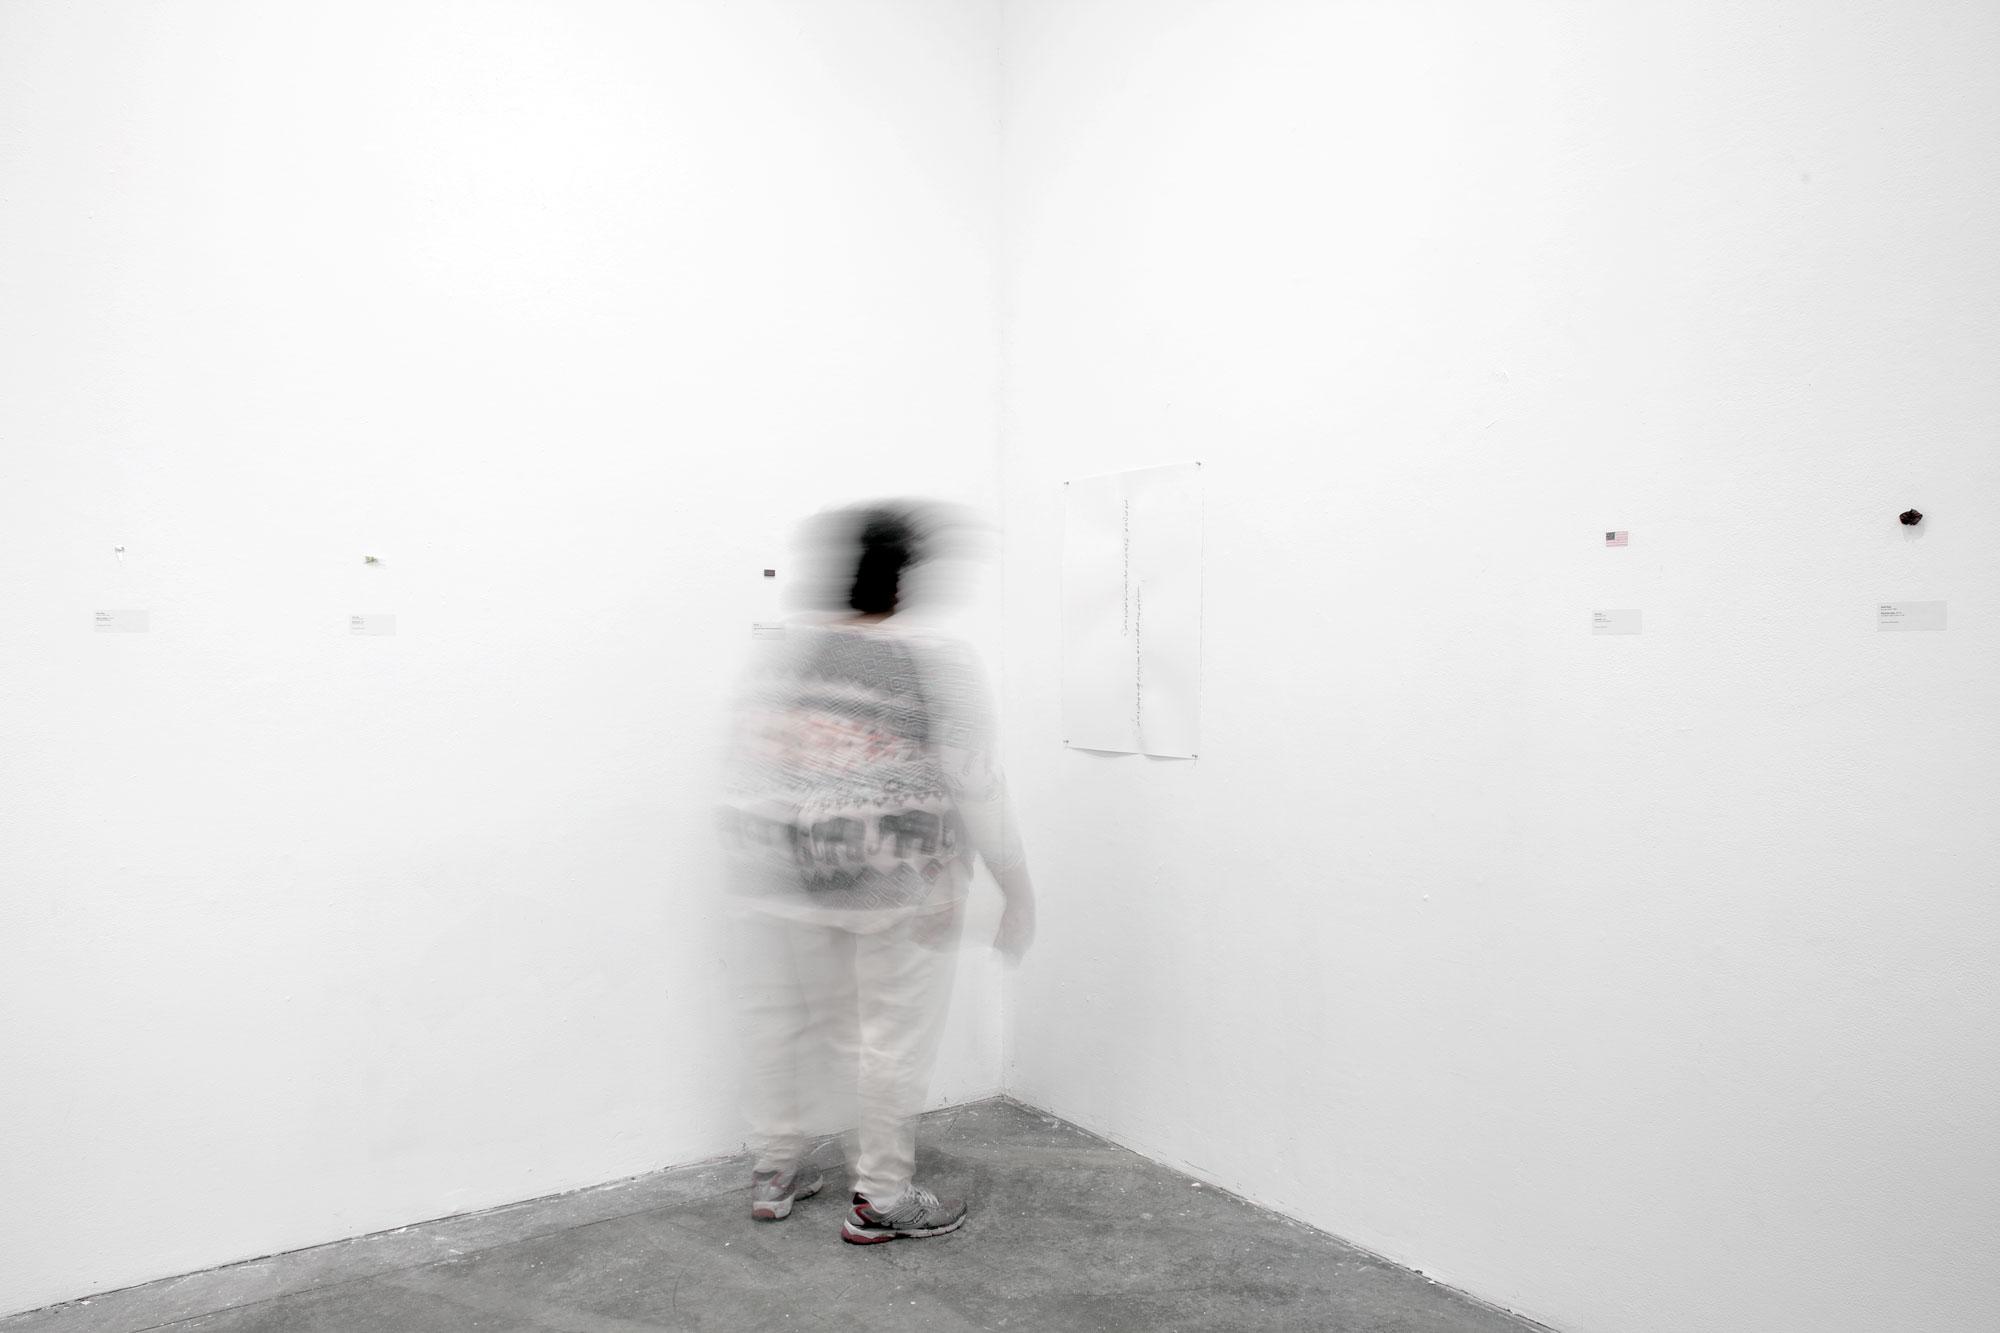 Meshki: Royal Black, Potato Sacks, i.e., Meaningmization, Exhibition Visitor